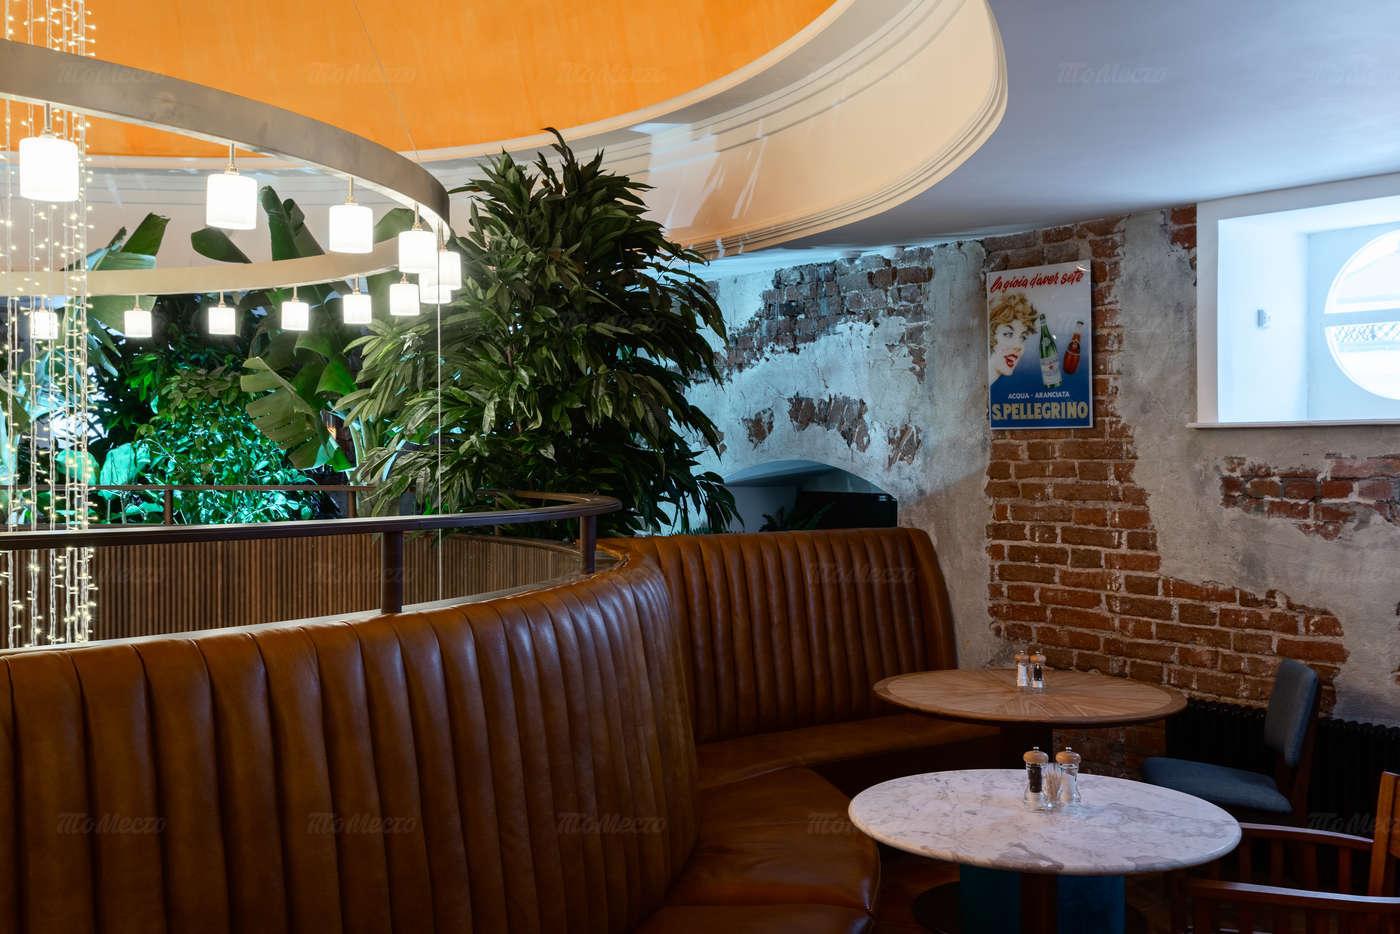 Ресторан Pinzeria by Bontempi (Пинцерия Бонтемпи) на Верх-Исетском бульваре фото 3